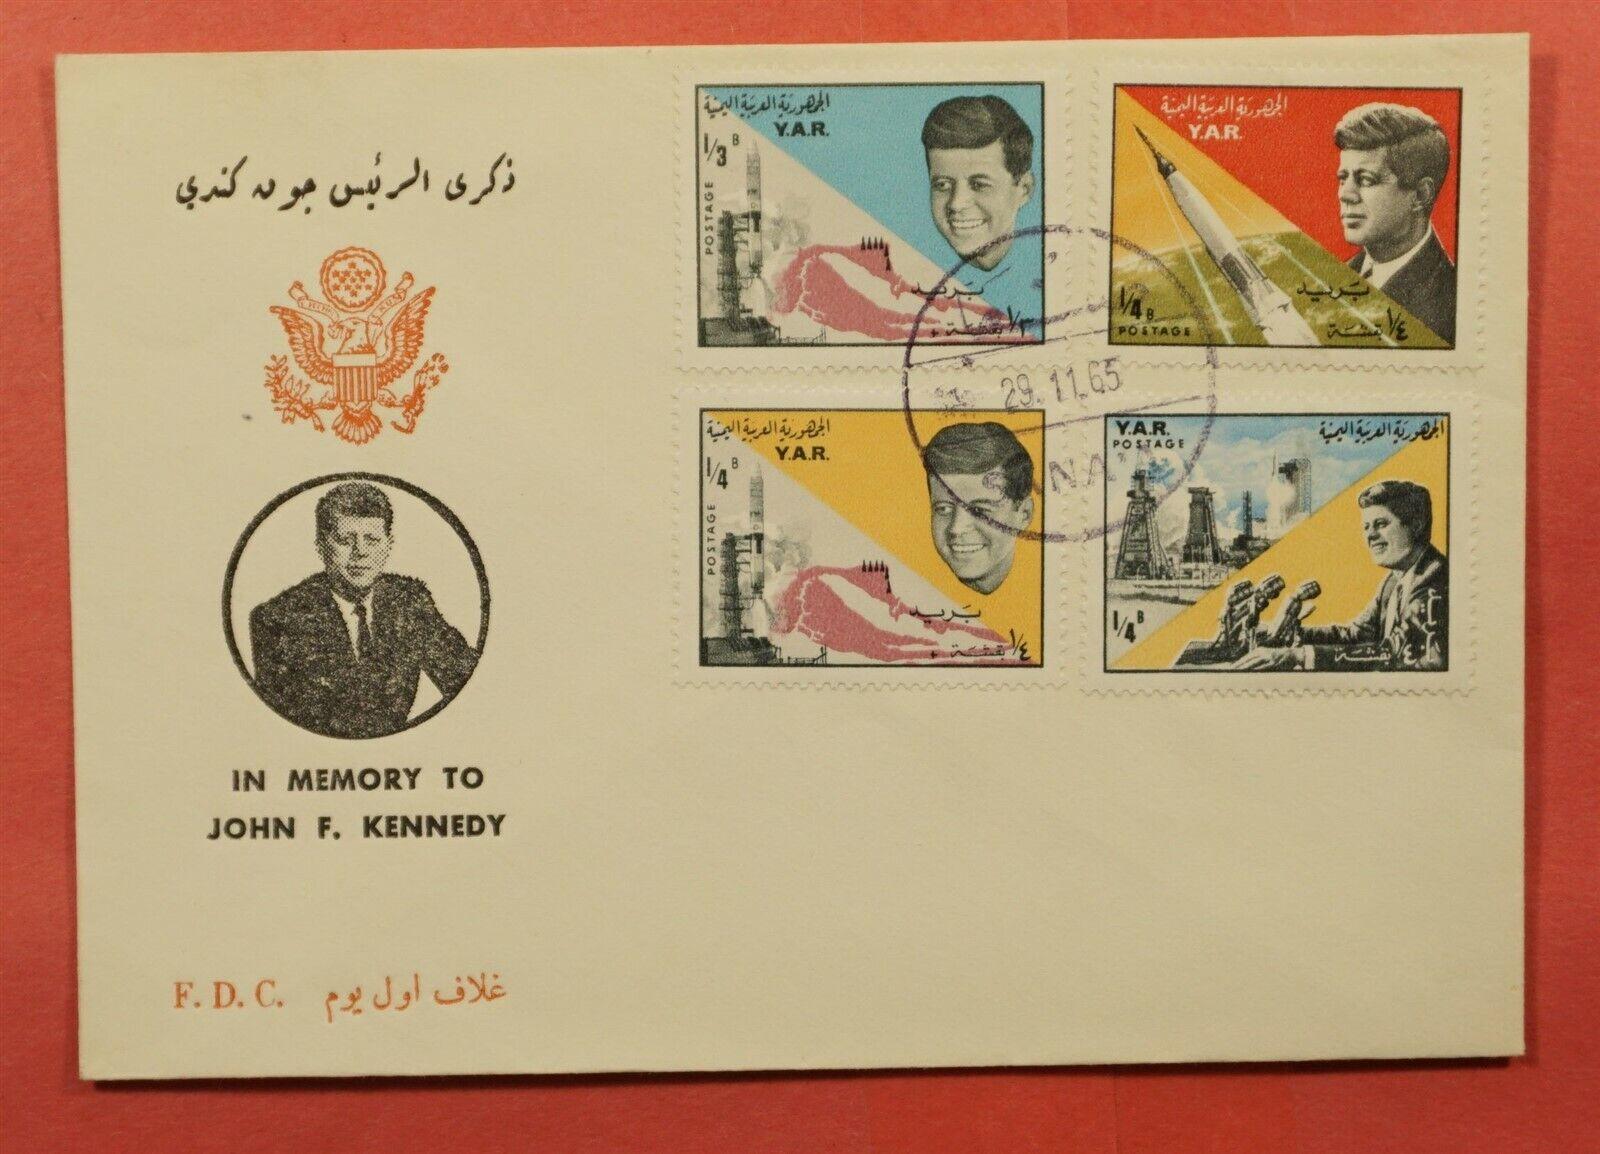 1965 YEMEN ARAB REPUBLIC FDC SPACE IN MEMORY JFK 196022 - $4.00